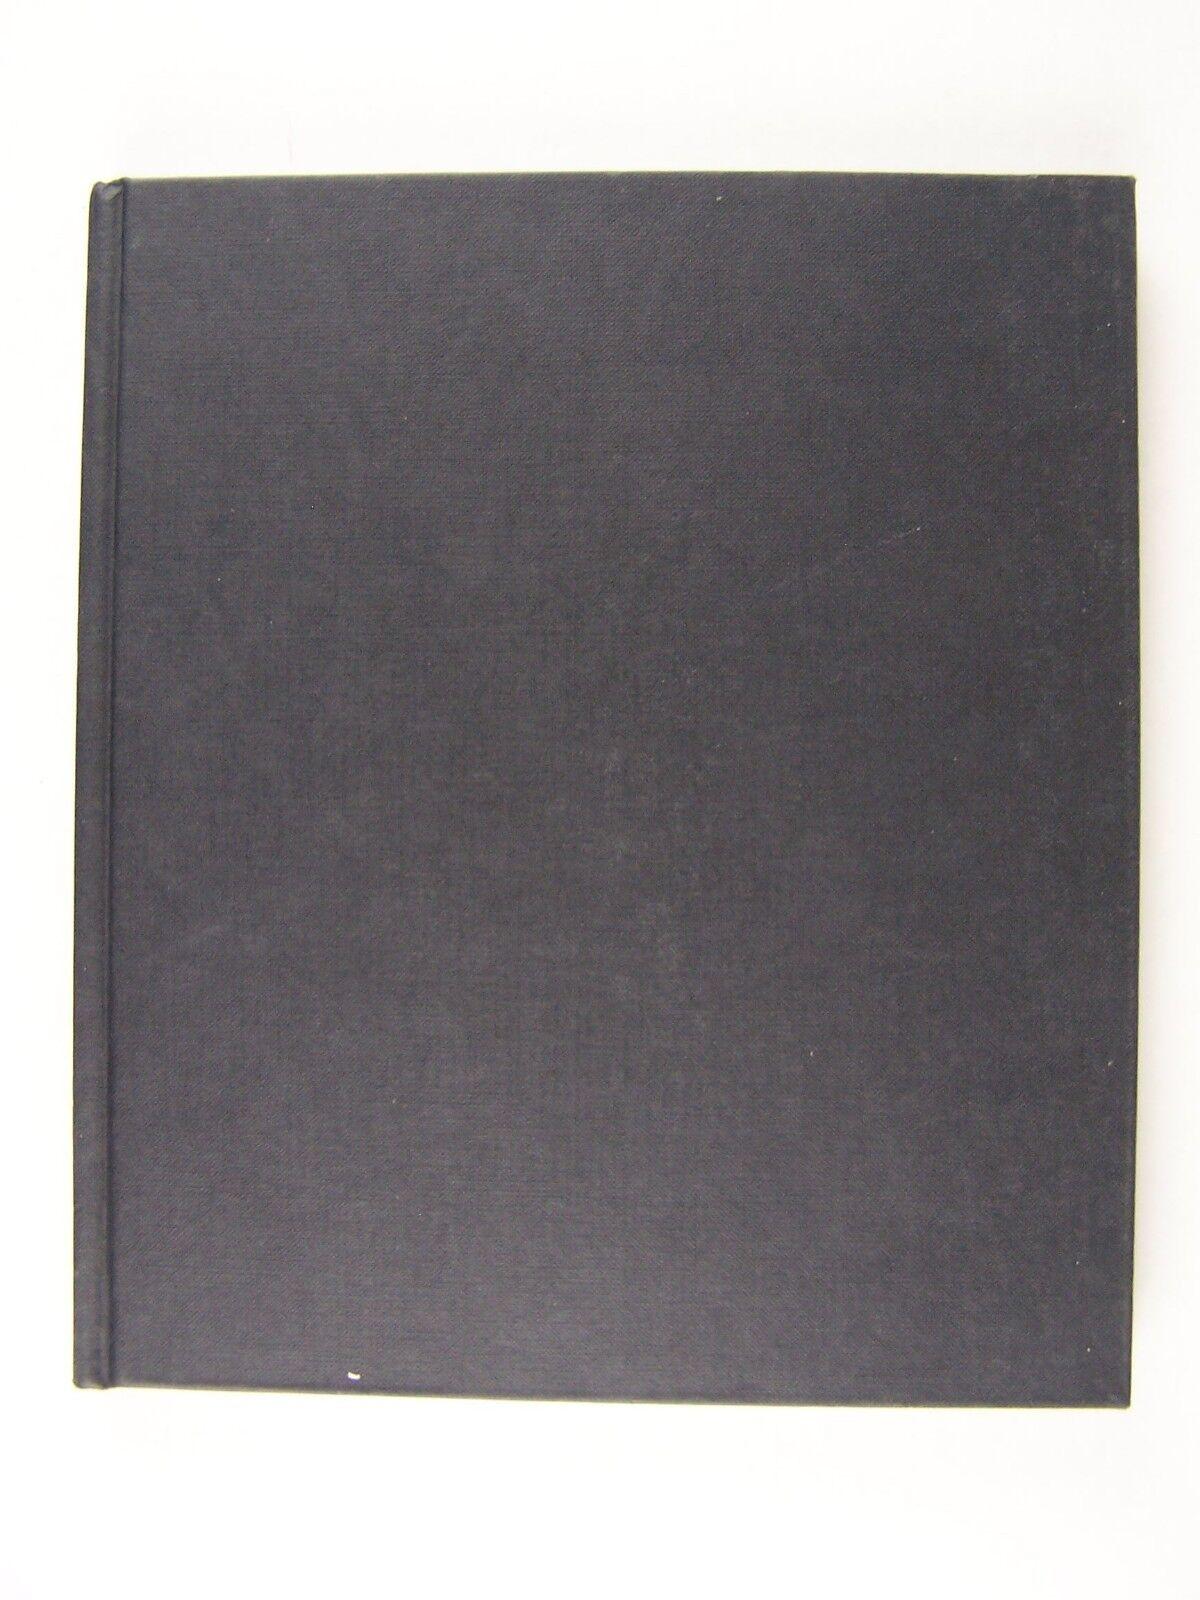 Queen Elizabeth II Hardcover by Penny Junor